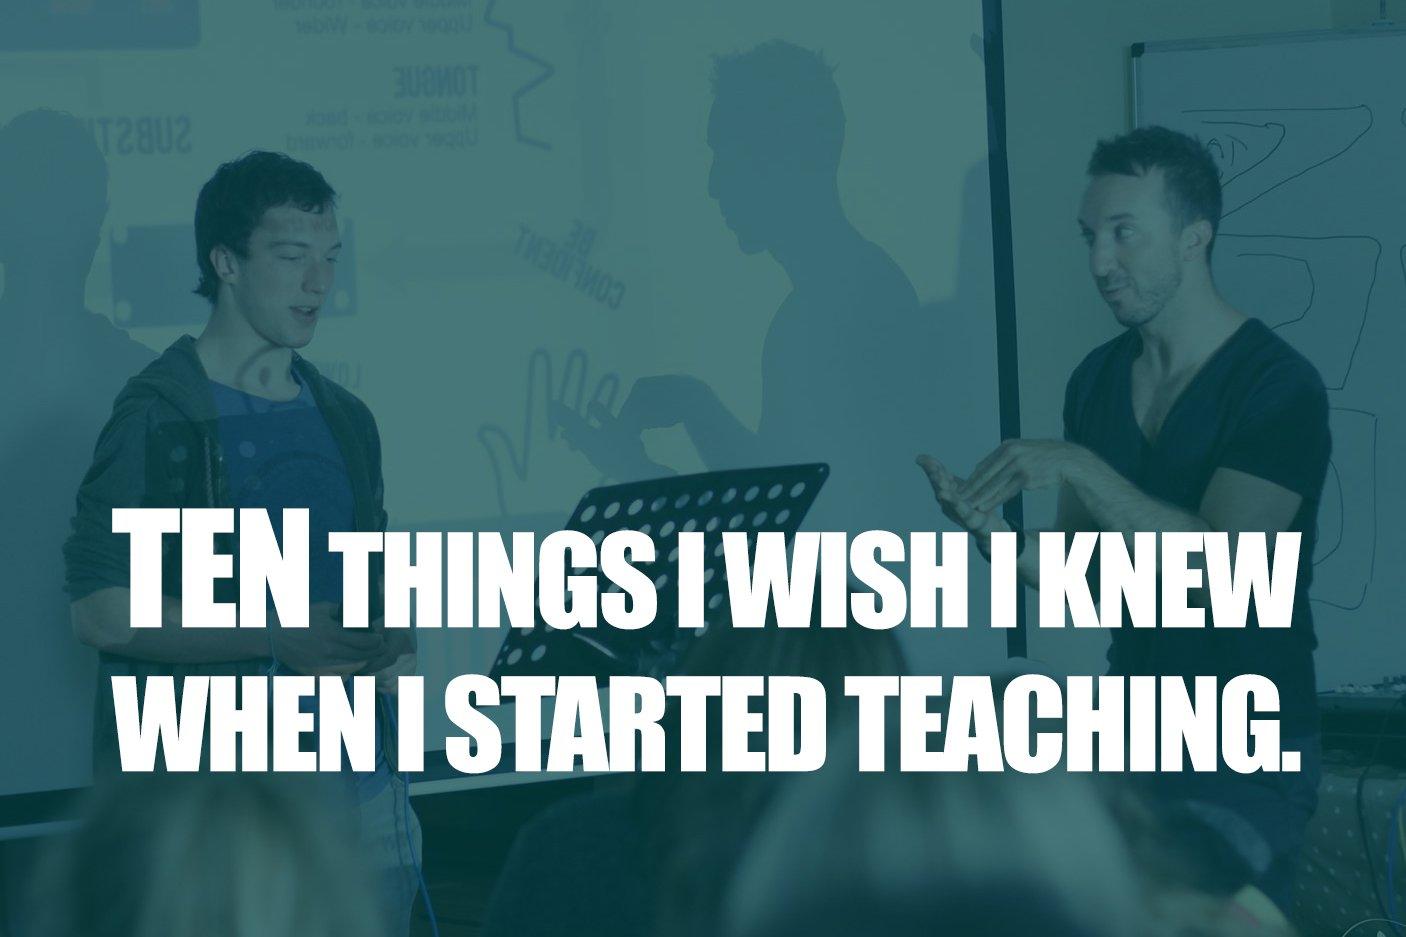 Ten Things I Wish I Knew When I Started Teaching.